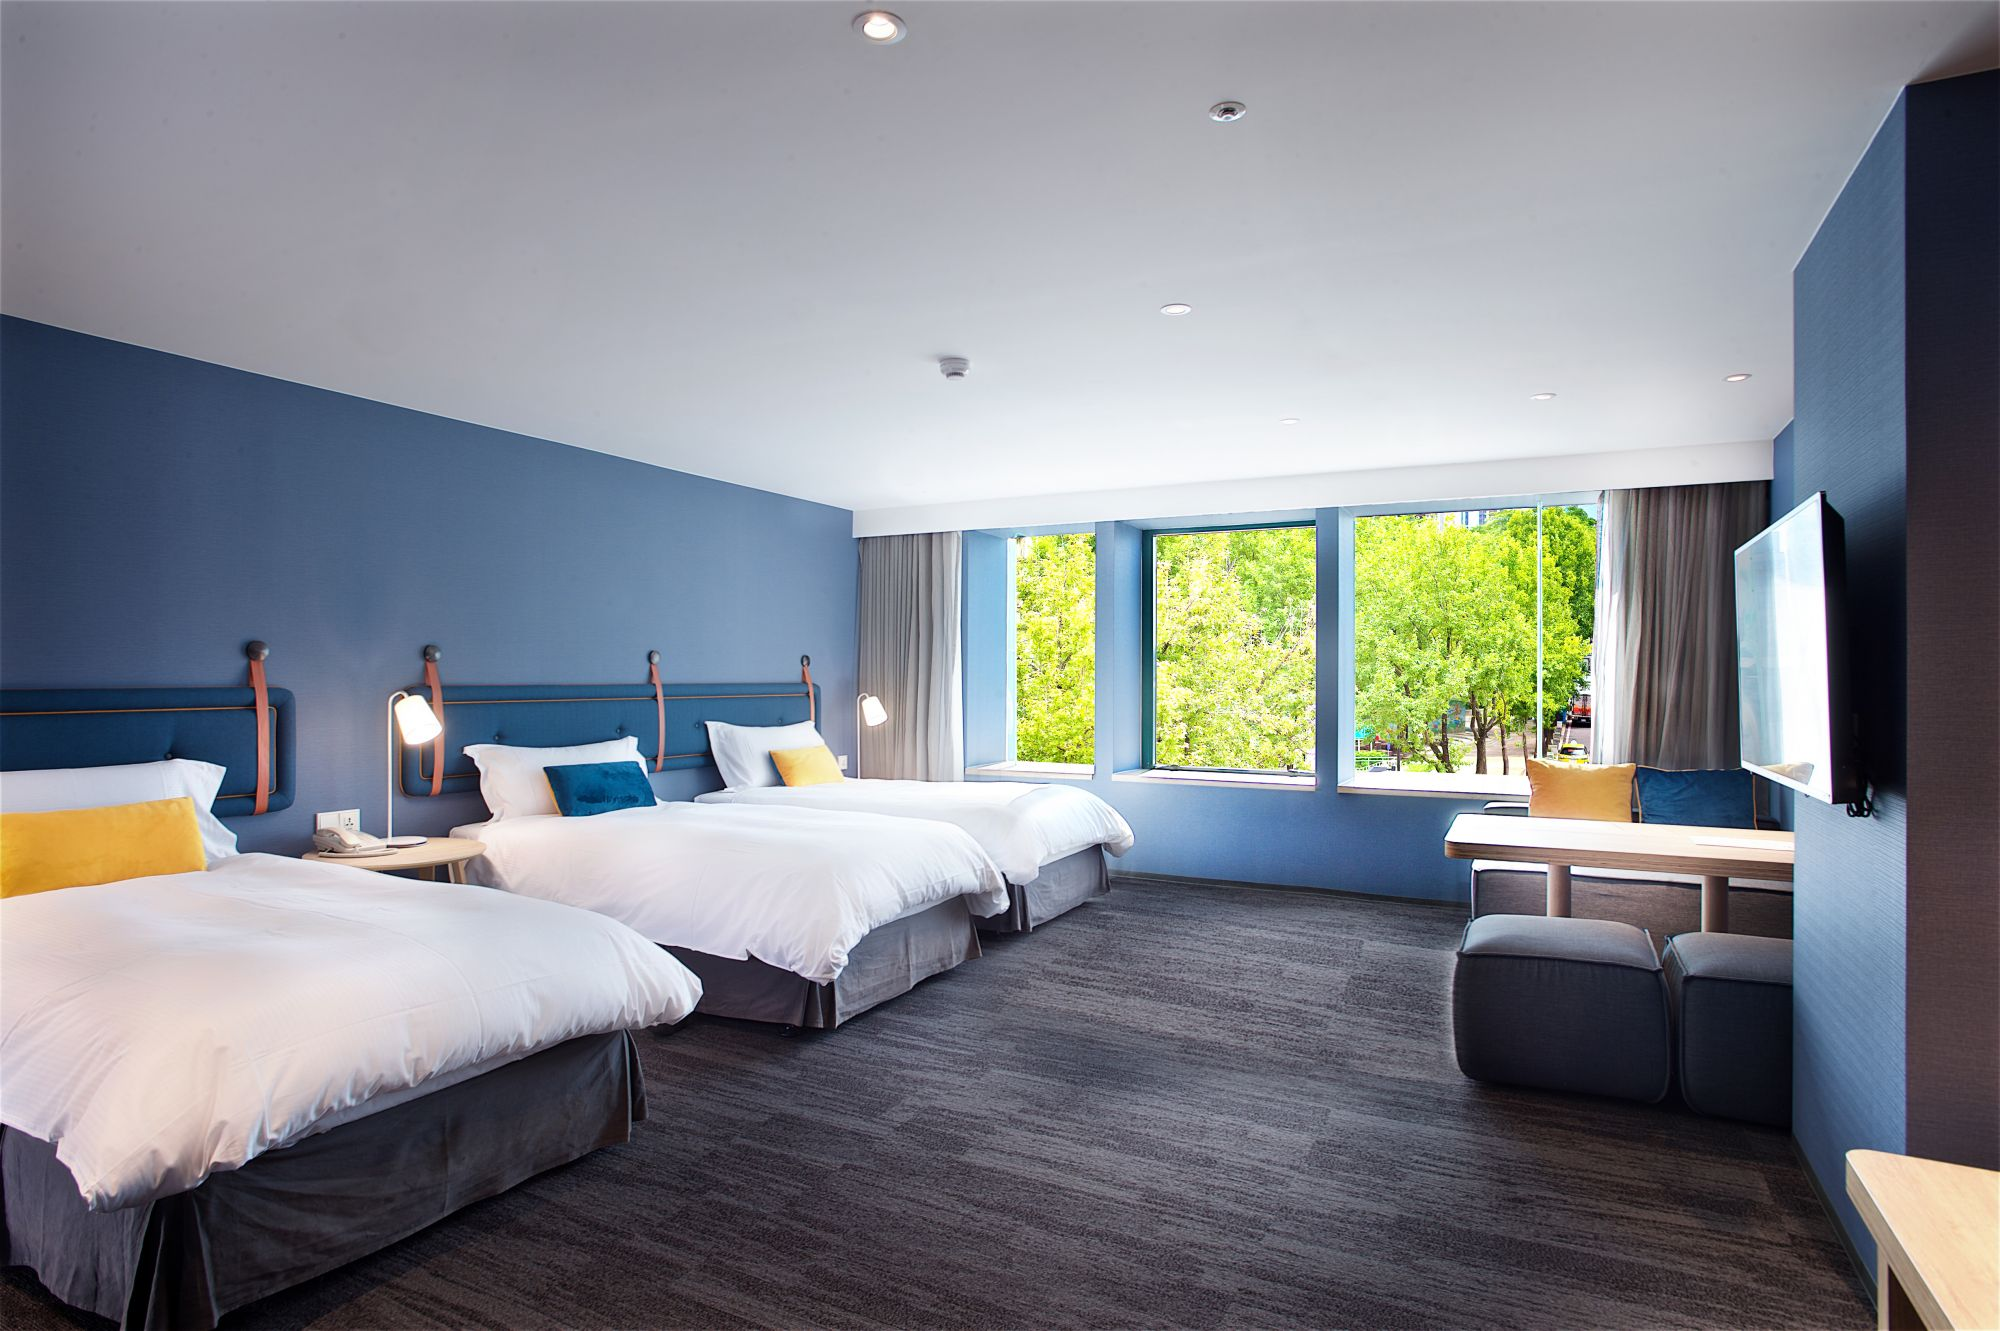 S Hotel、捷絲旅林森館 、北投雅樂軒加入防疫旅館行列